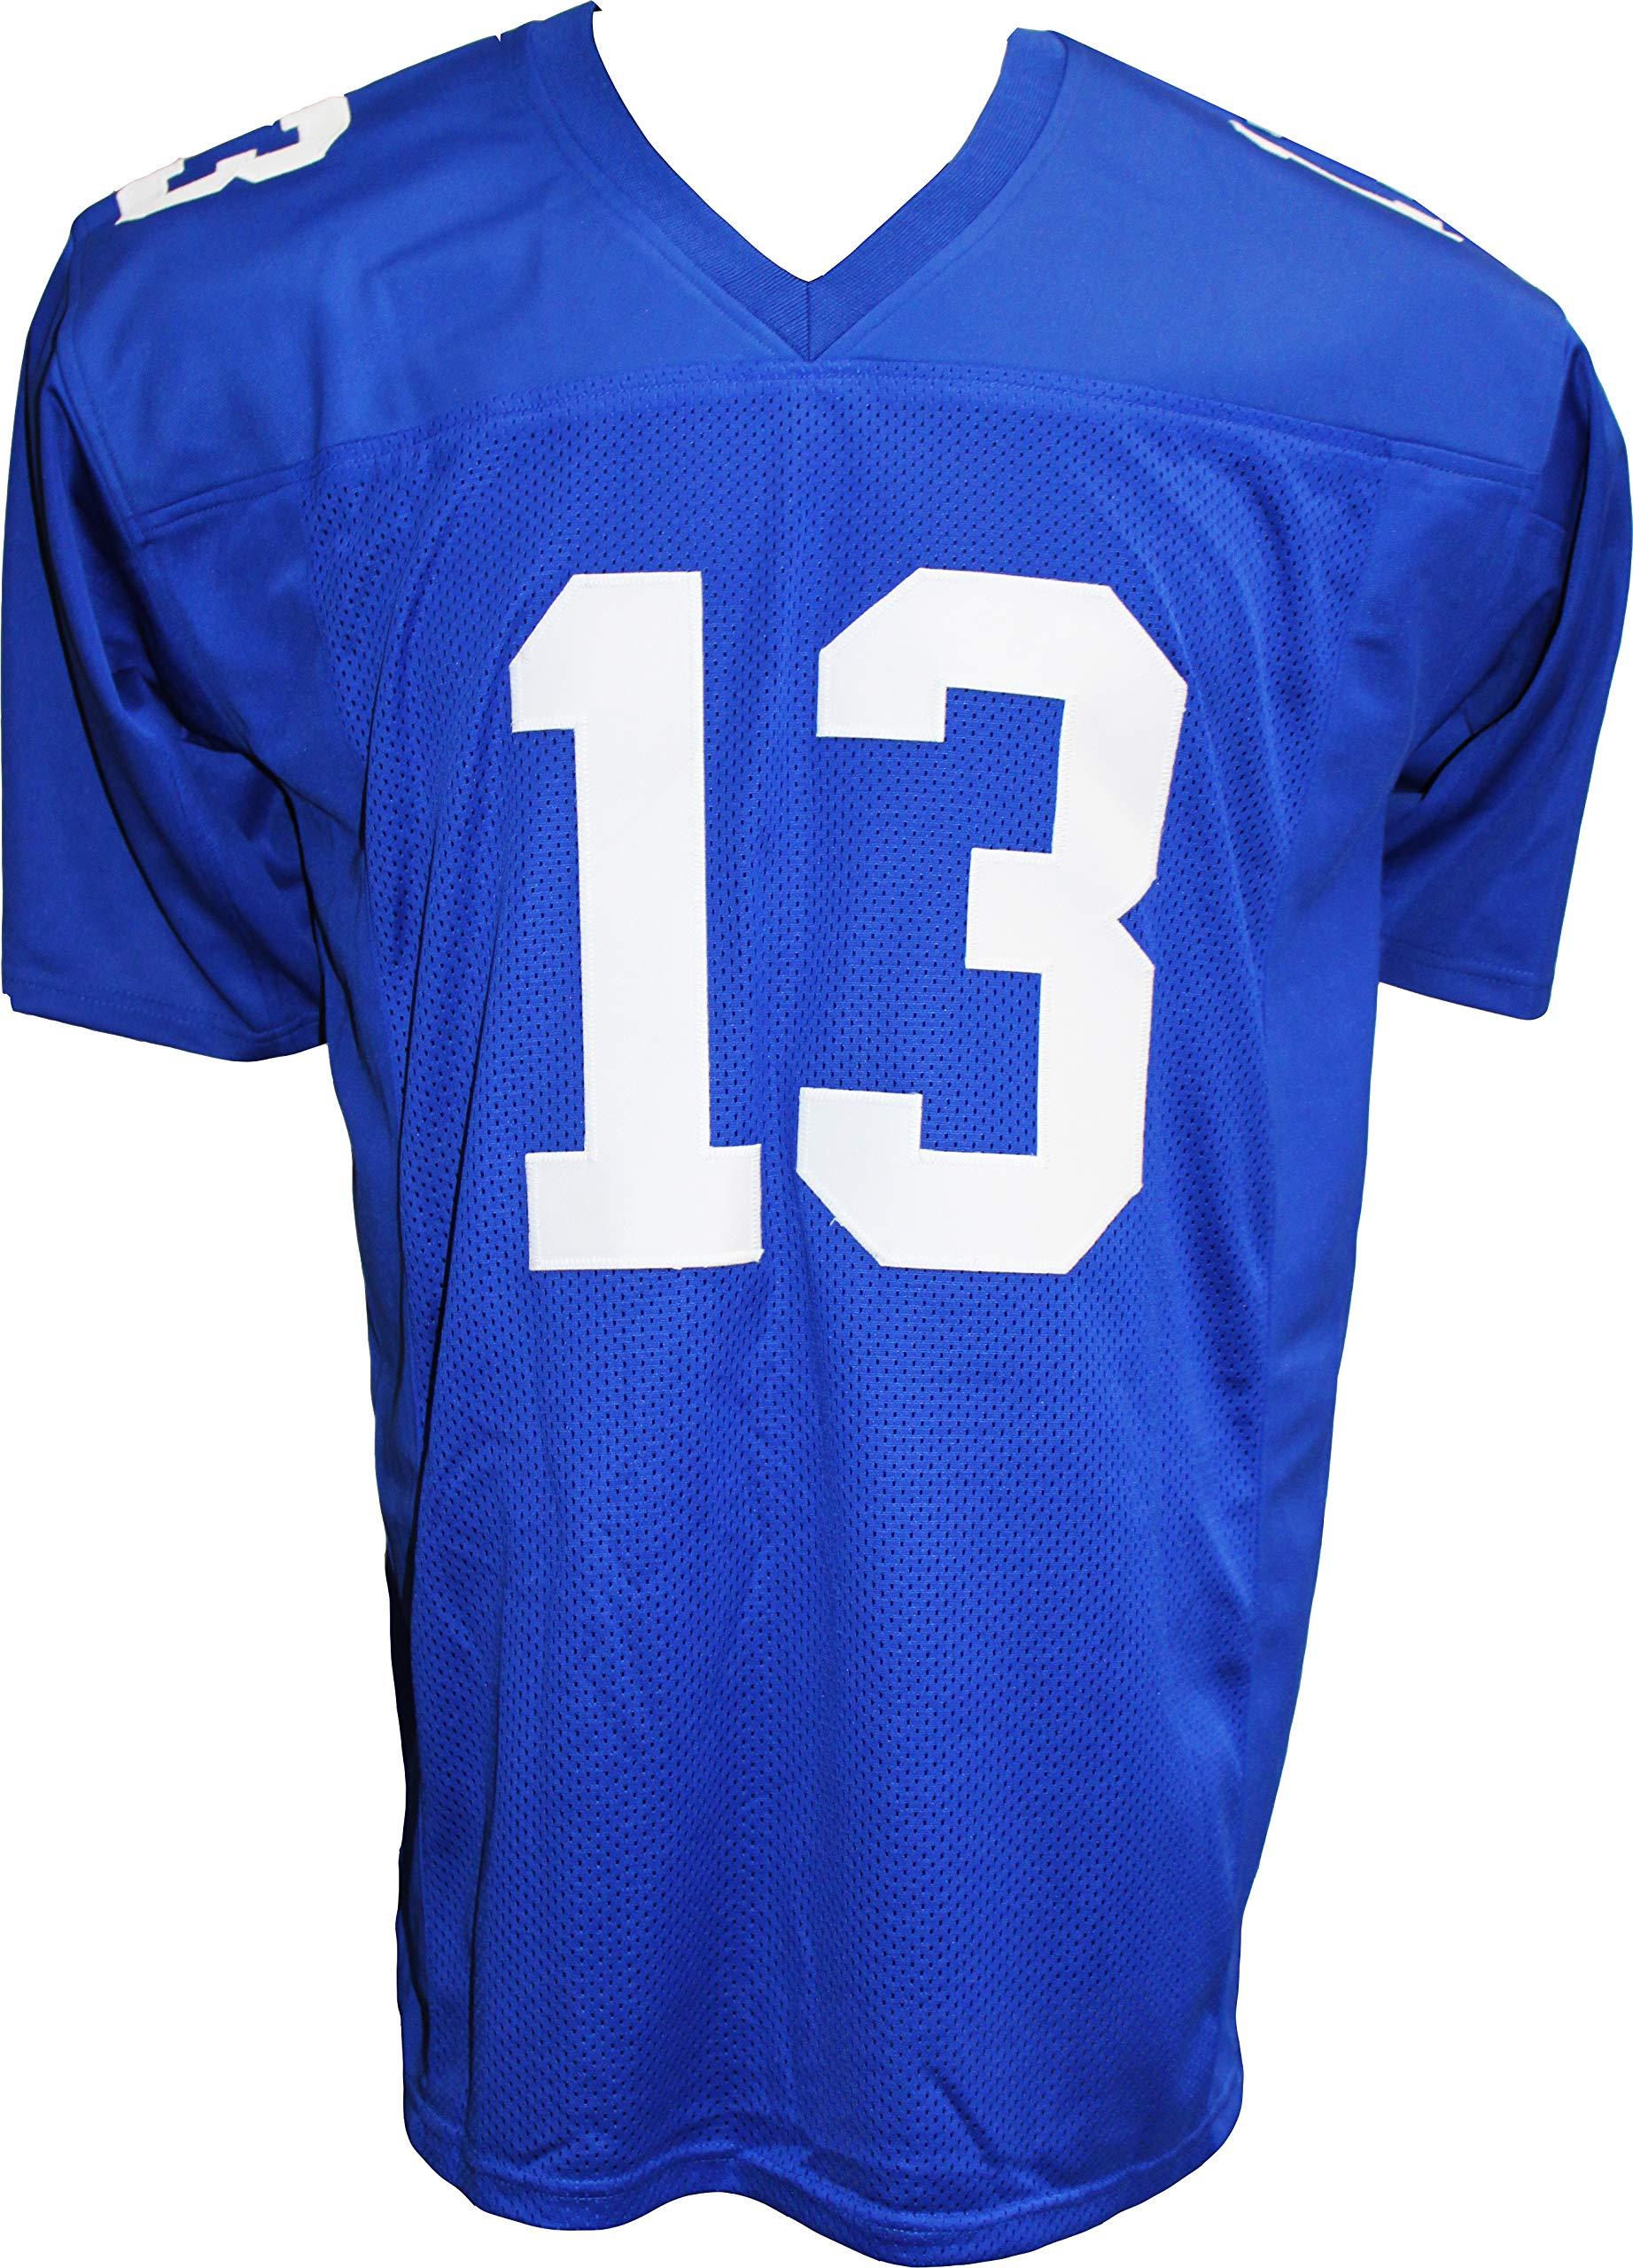 Authentic Odell Beckham Jr. Autographed Signed Custom Jersey (JSA COA) New York Giants WR